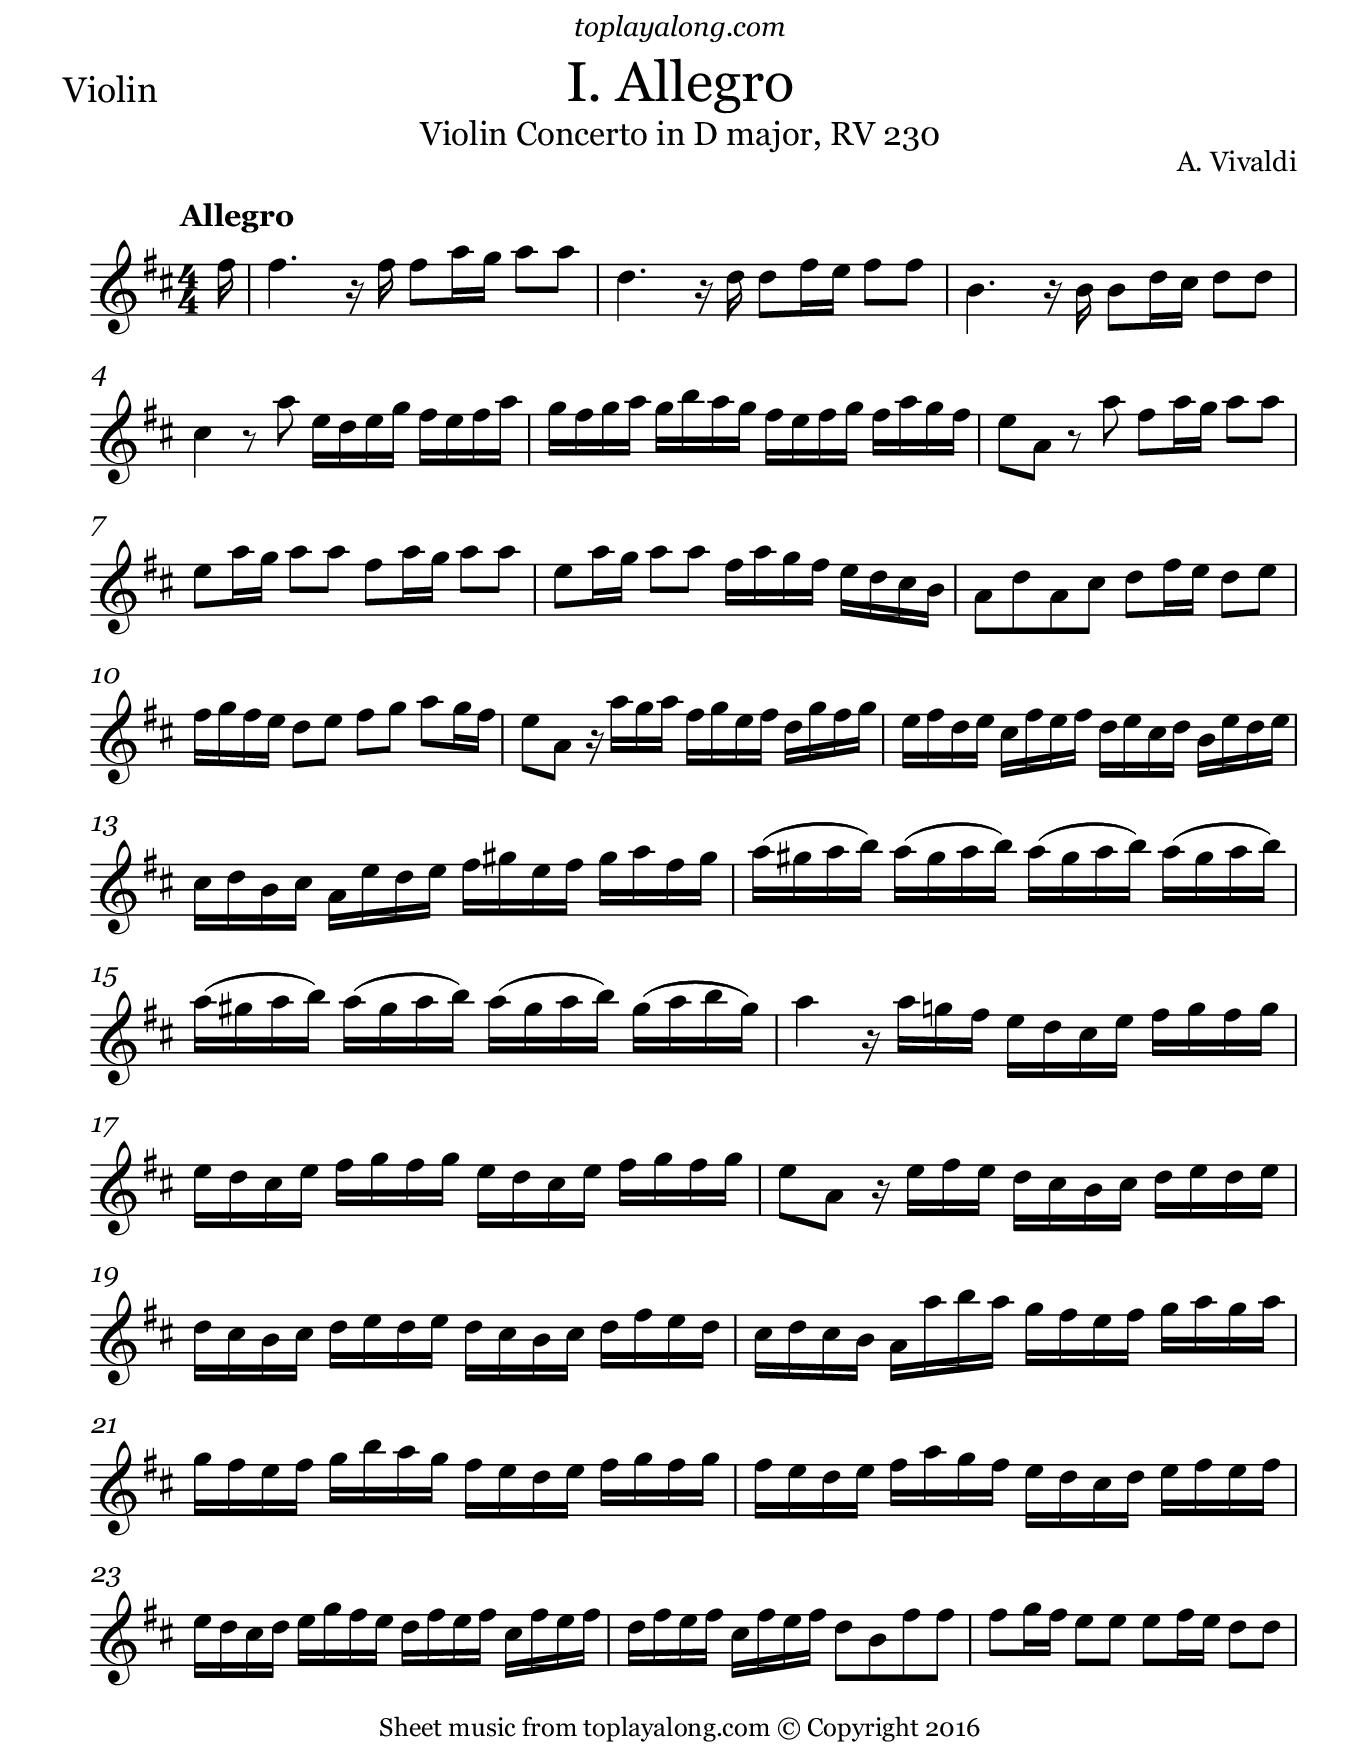 Violin Concerto in D major (I. Allegro) by Vivaldi. Sheet music for Violin, page 1.